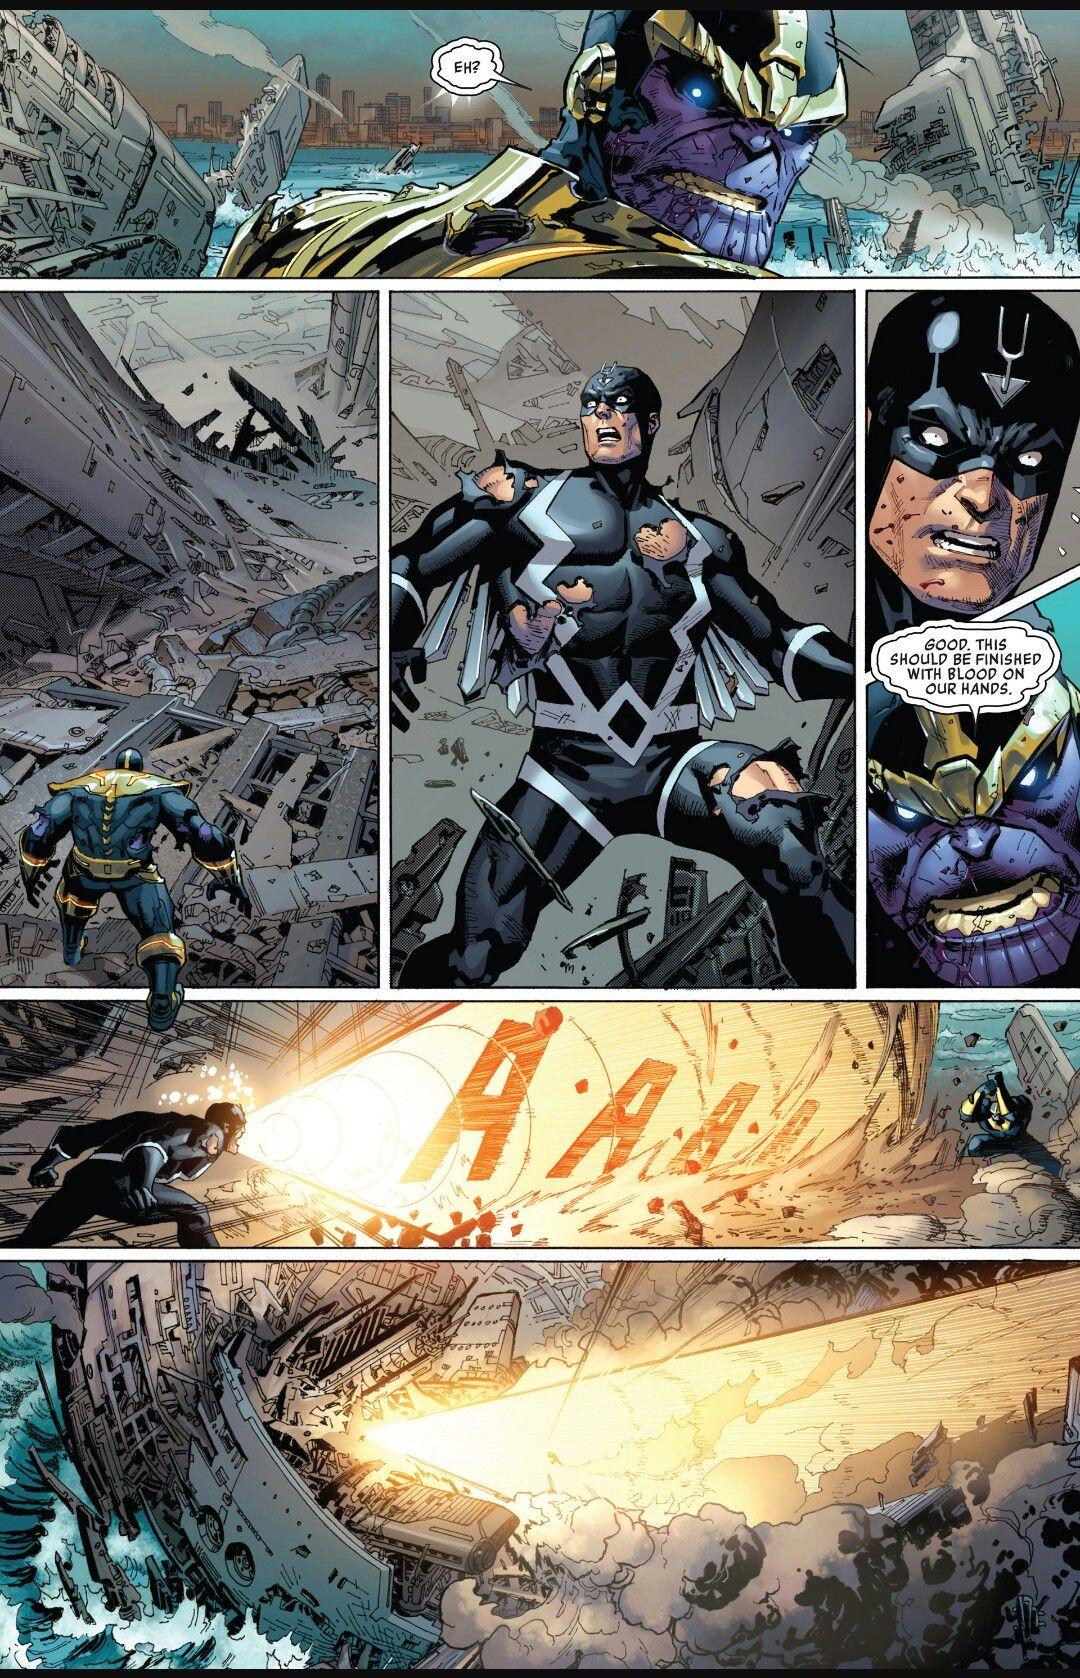 Black Bolt Vs Thanos Marvel Inhumans Marvel Comics Art Marvel Comics Superheroes